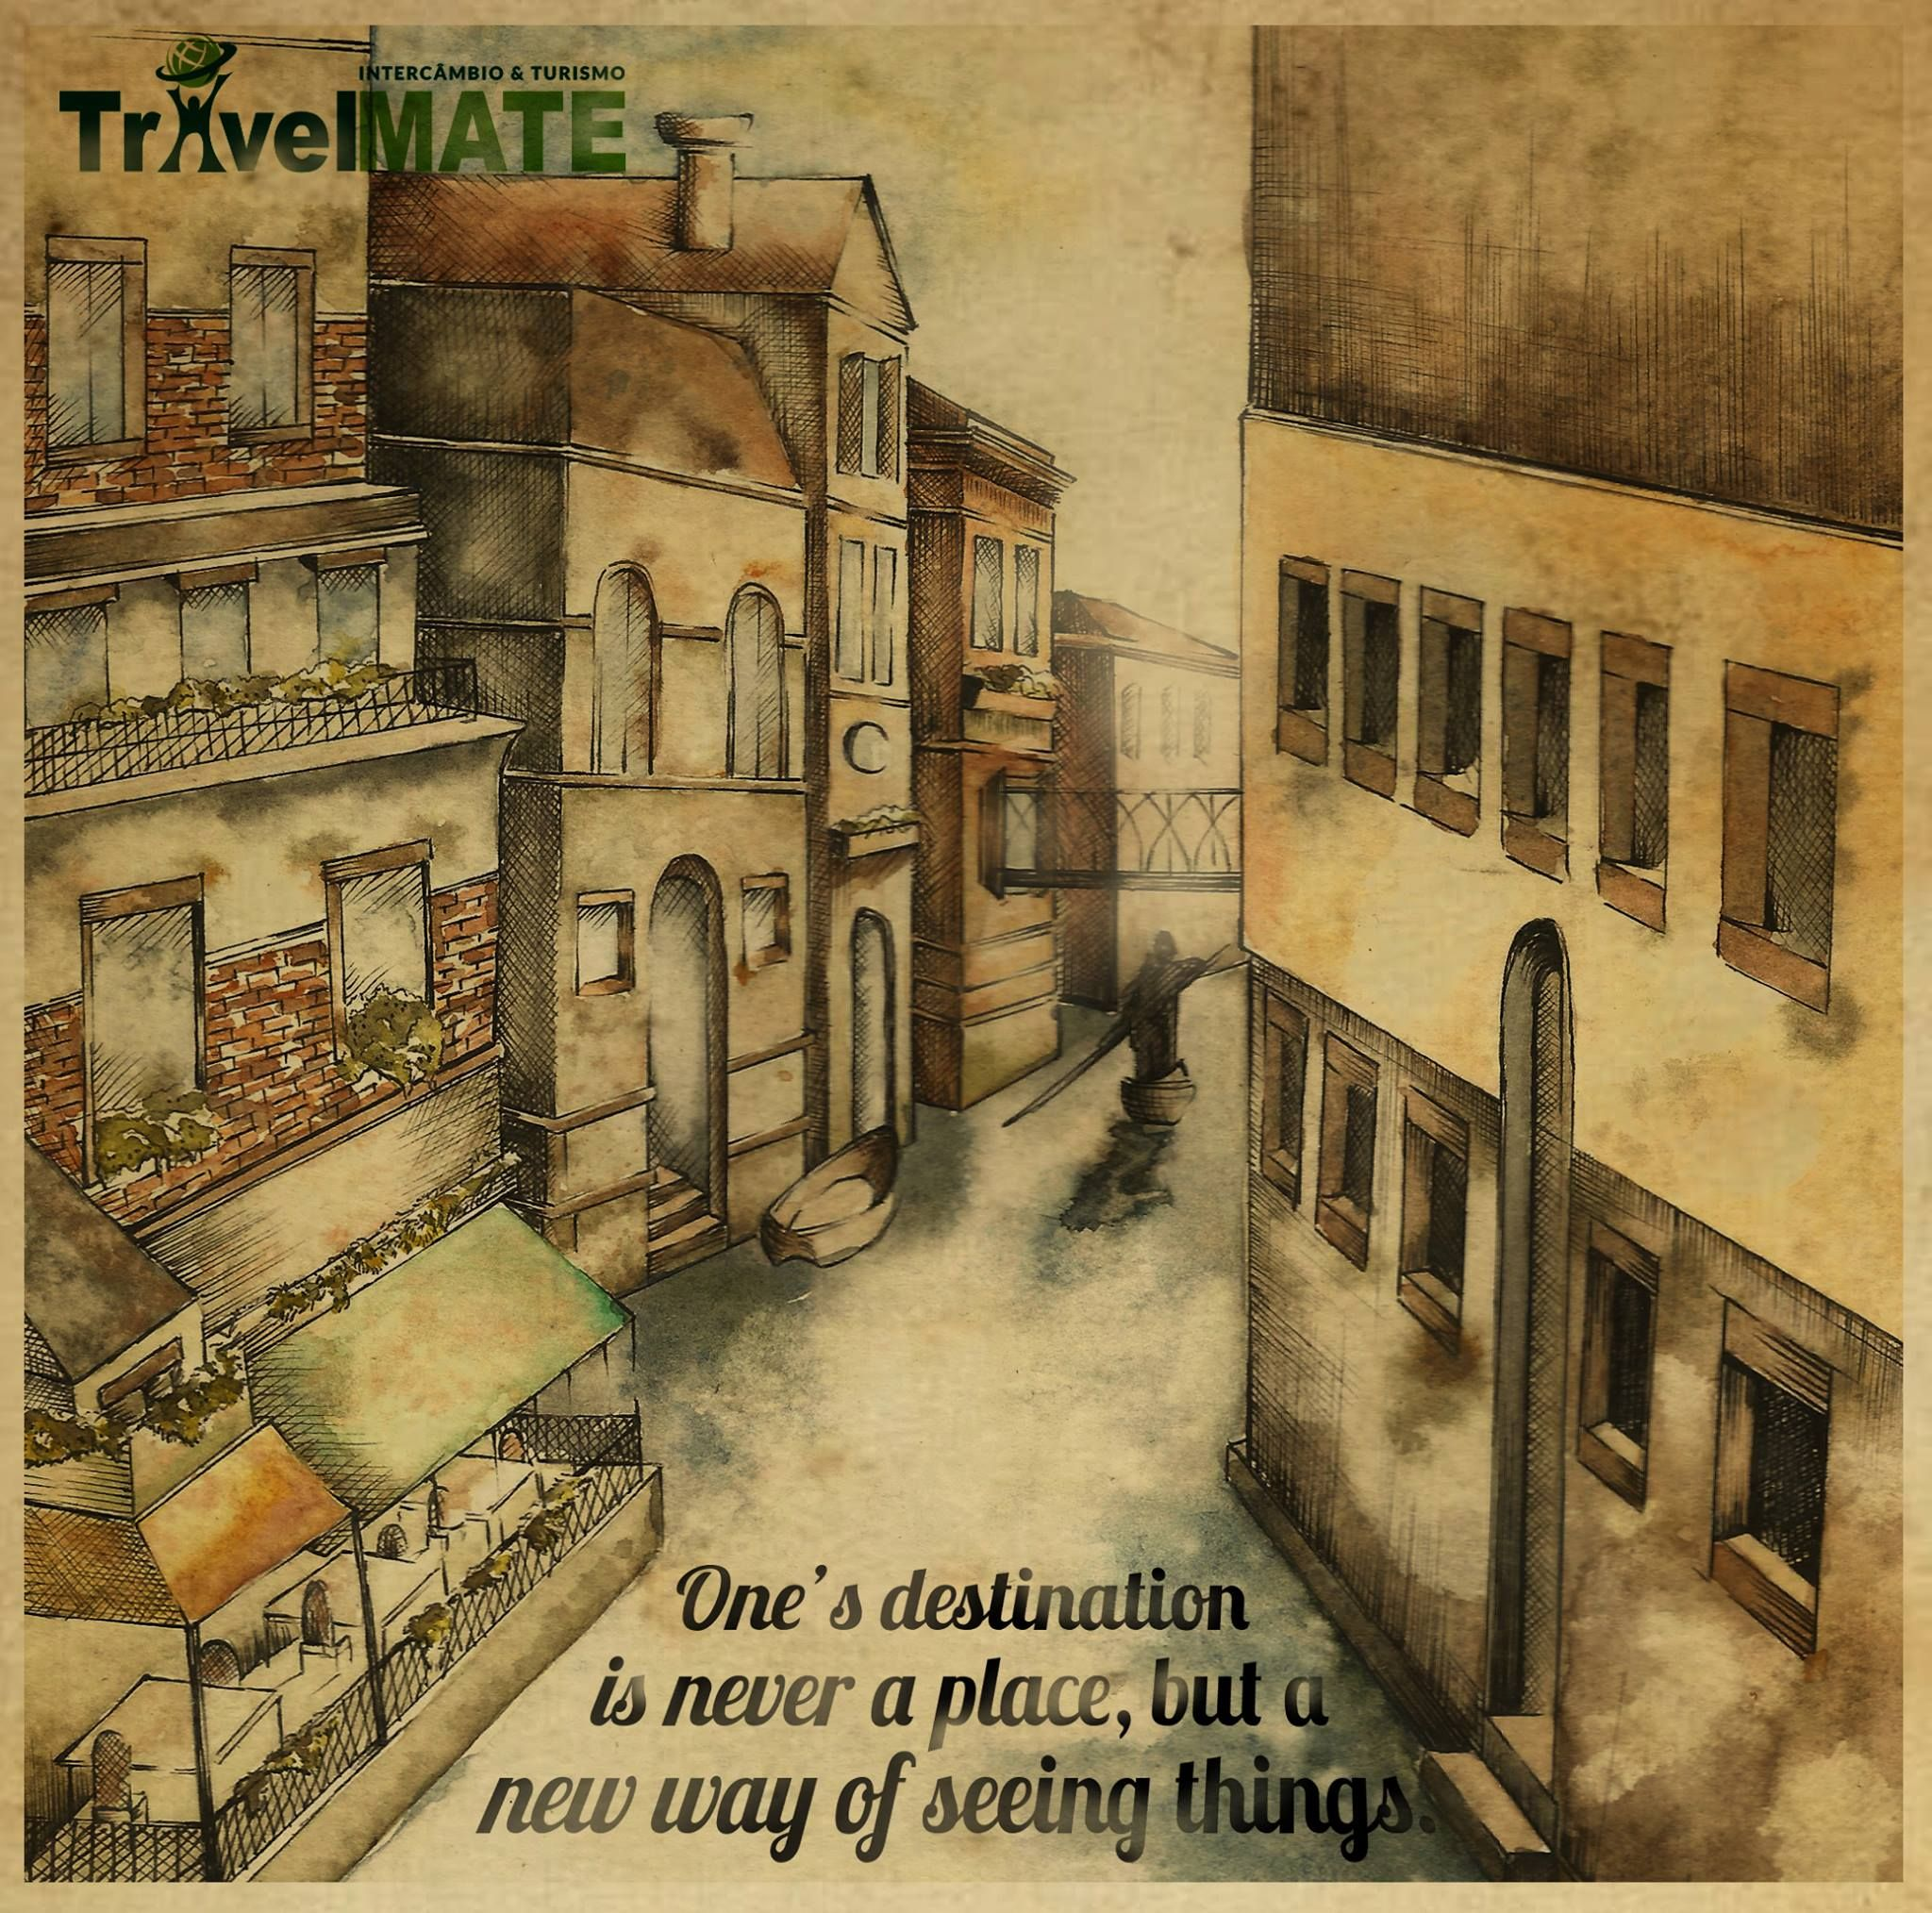 #mytravelmate